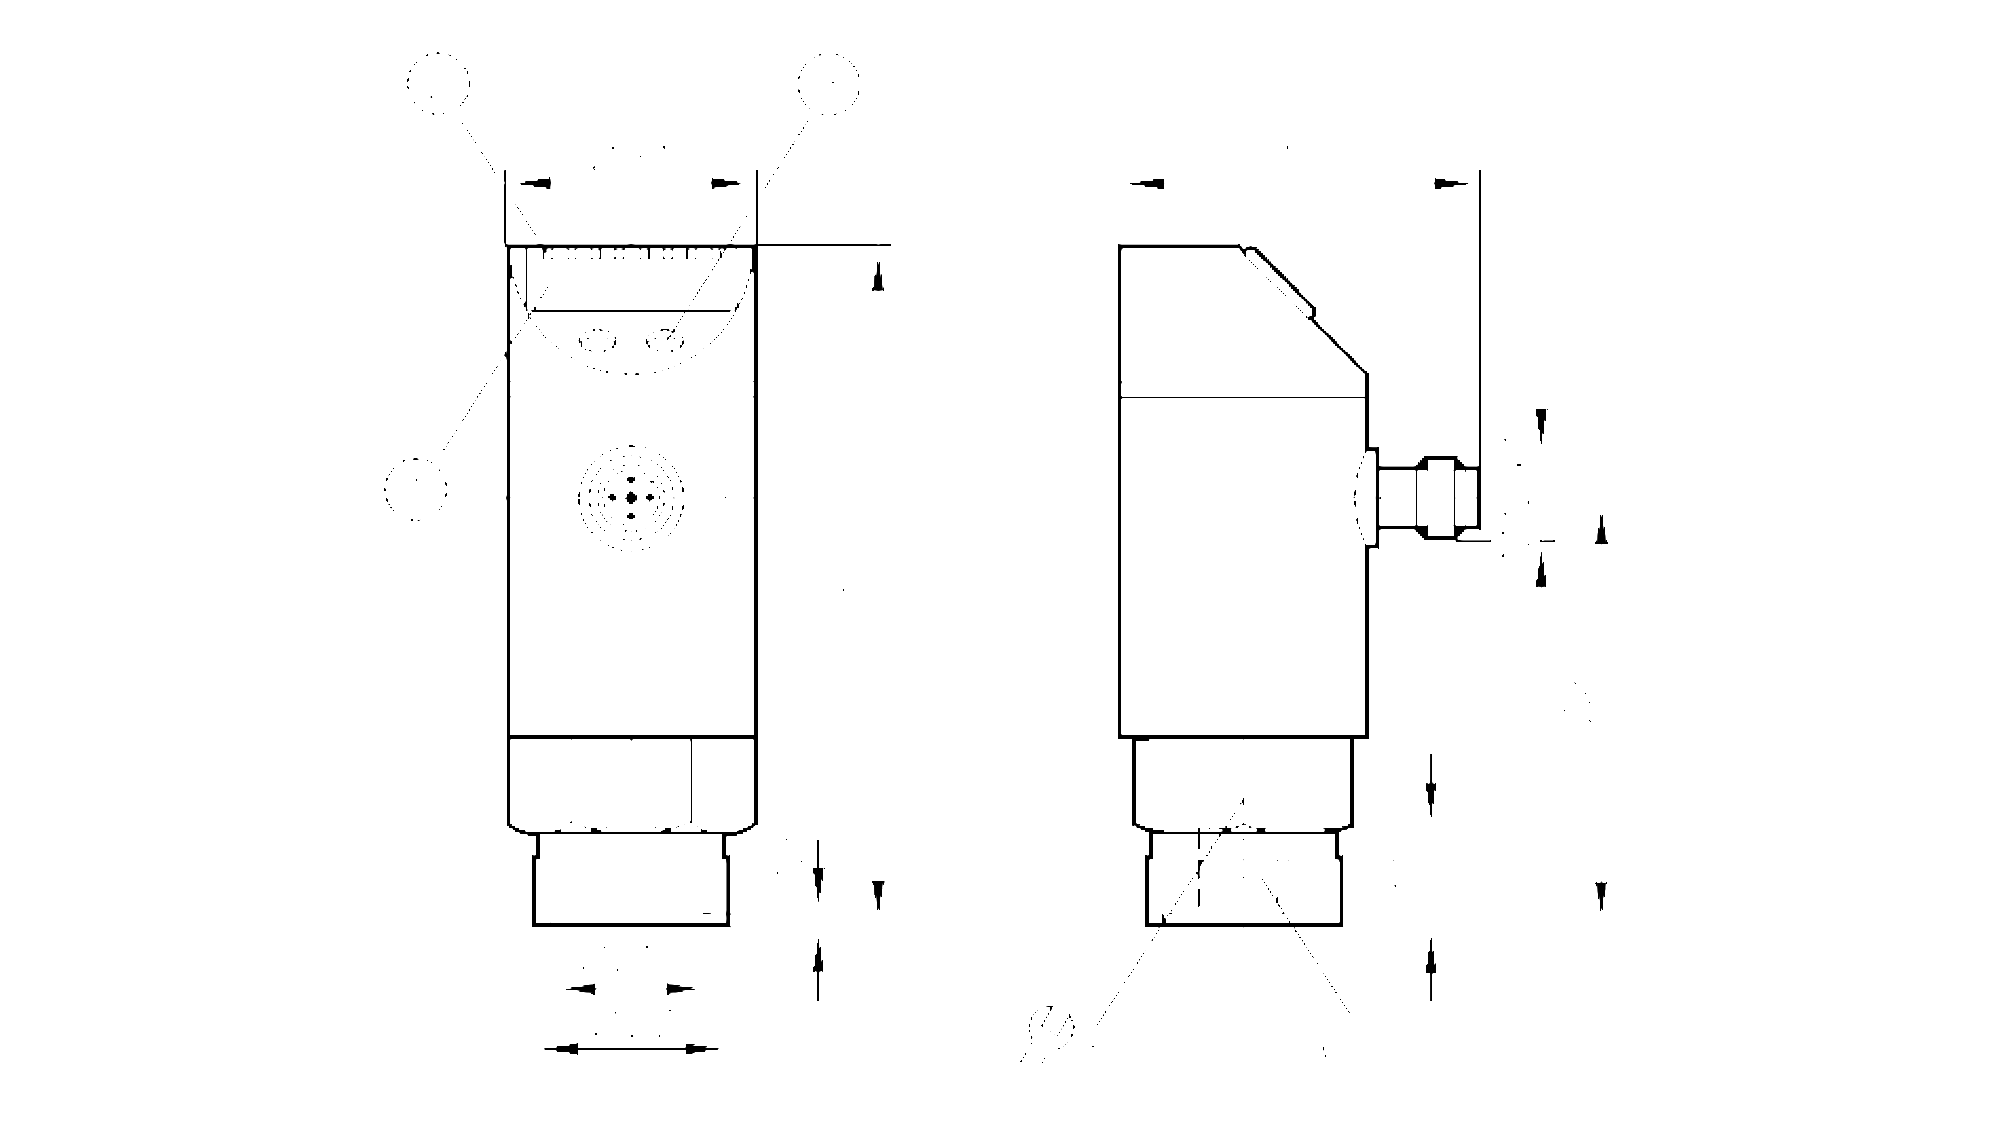 ifm efector 500  Drucksensor PNI022